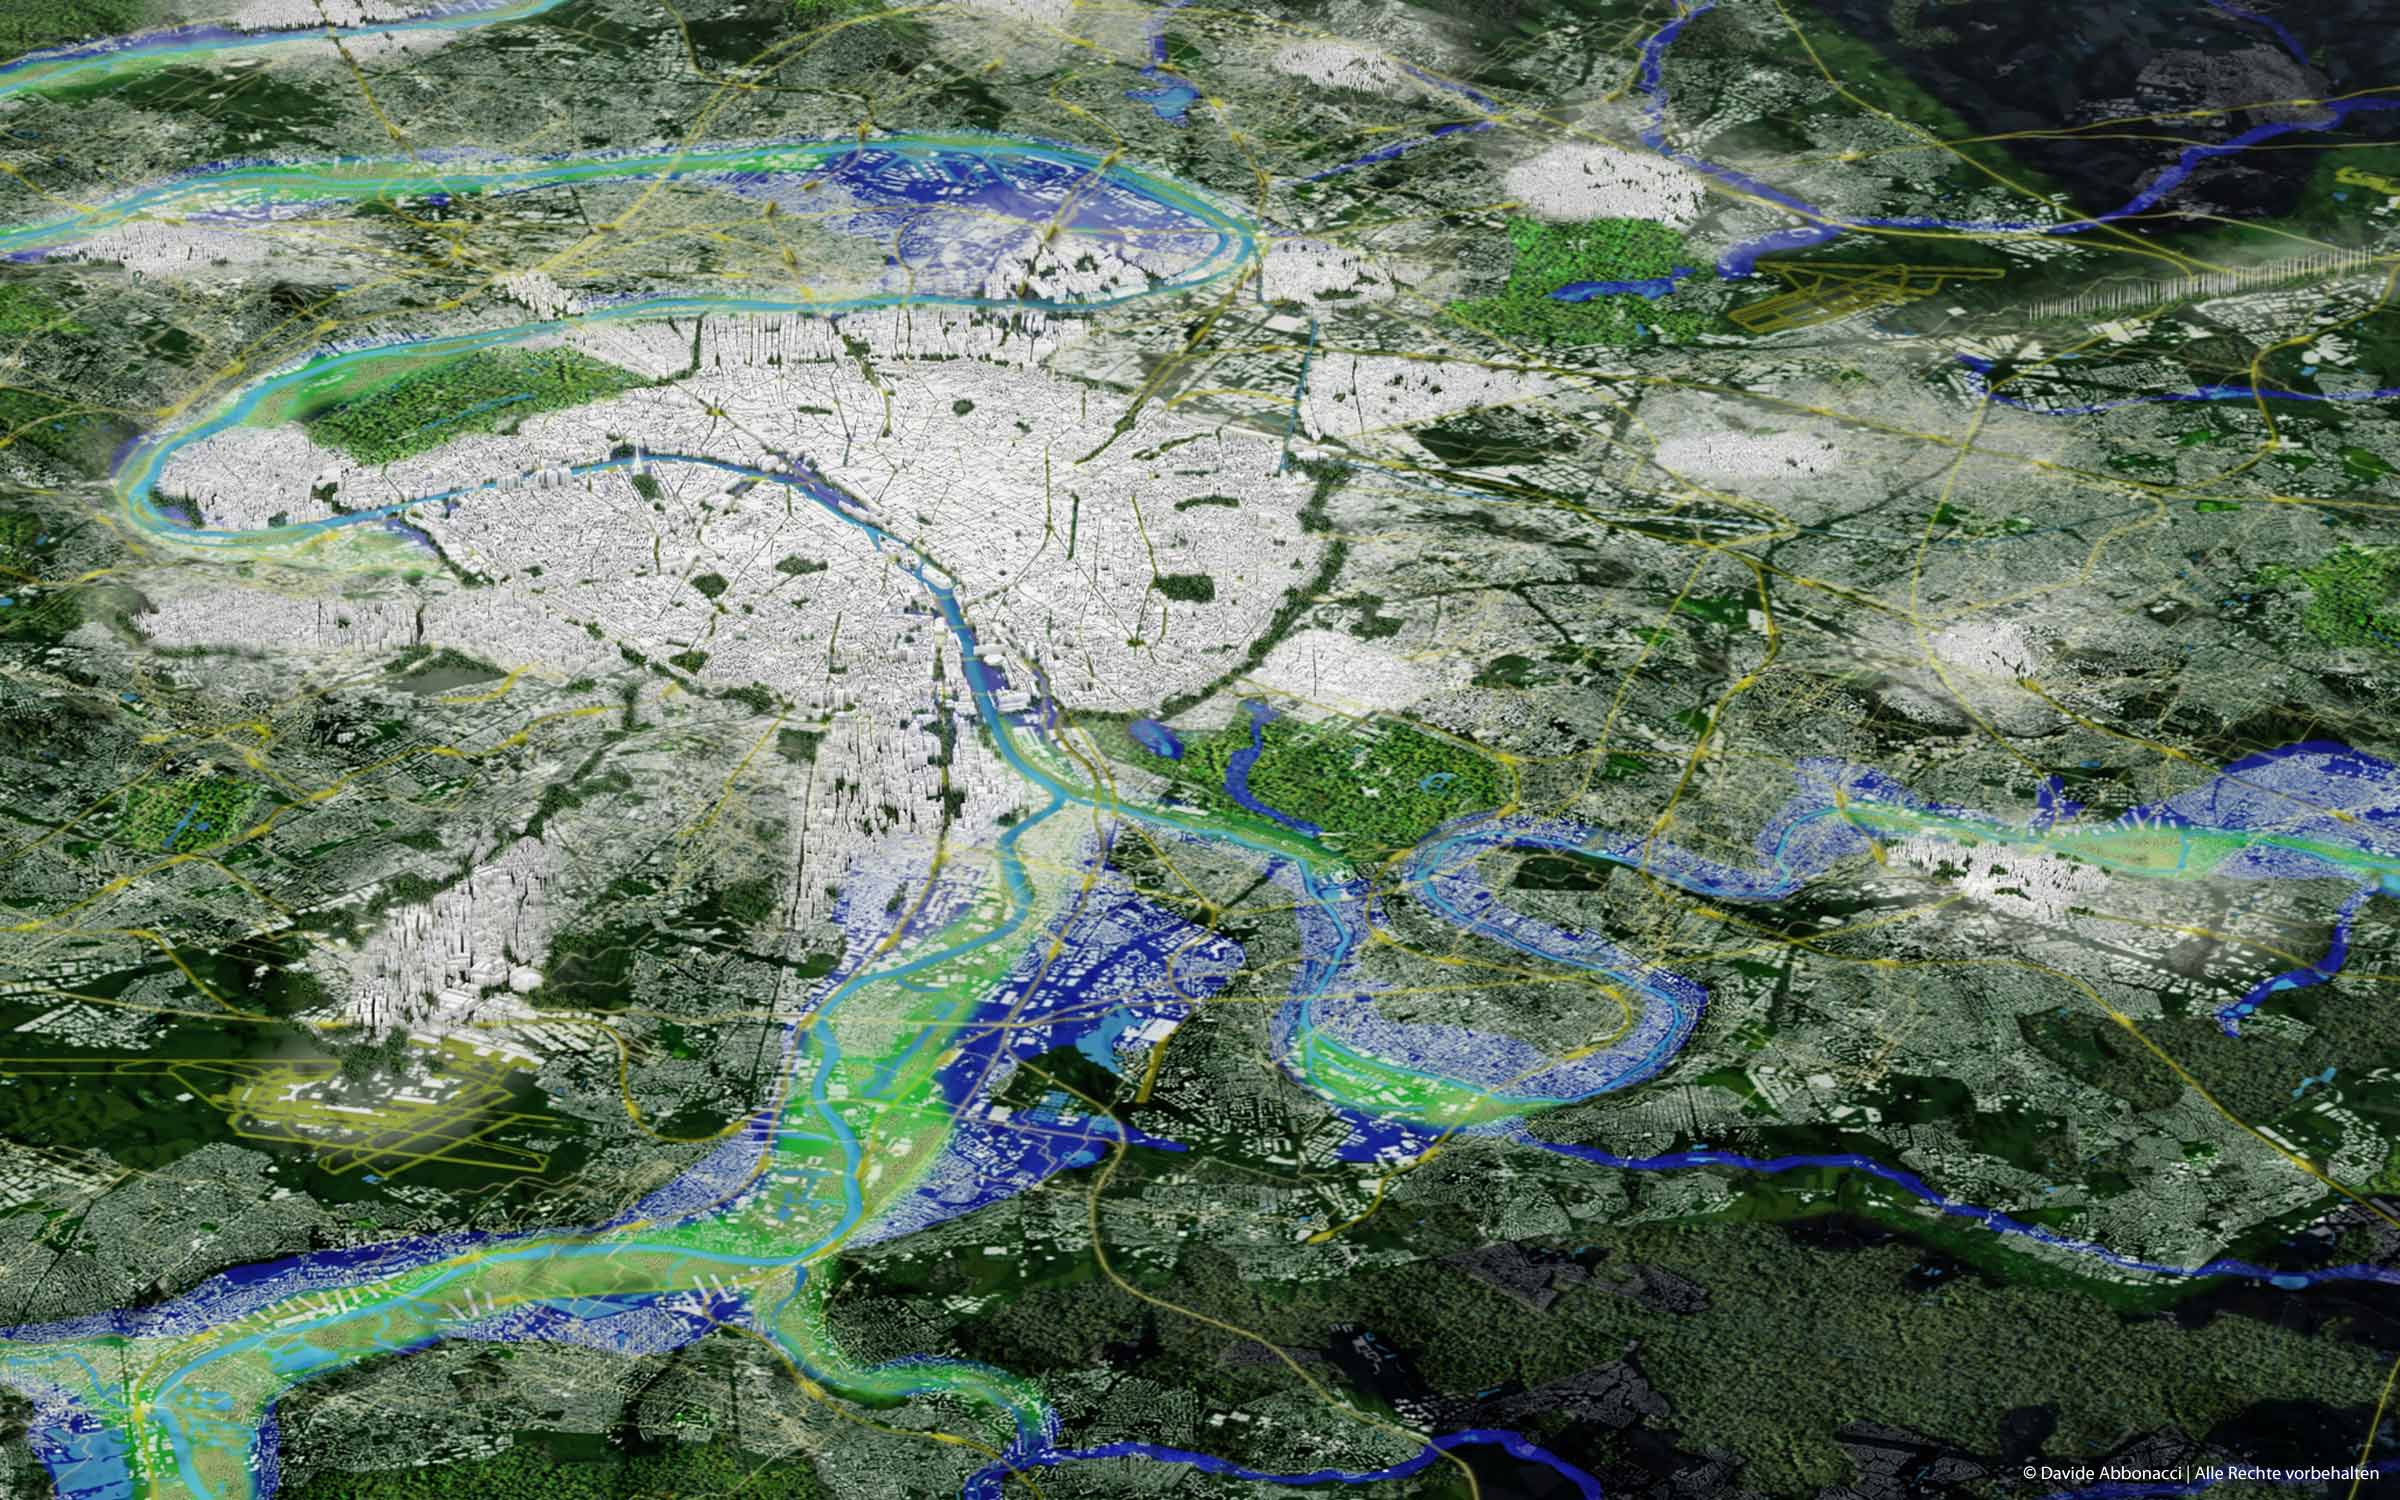 Grand Paris - Métropole Douce - Propositions for the Post-Kyoto Metropolis   LIN Architects Urbanists   2009 Masterplan